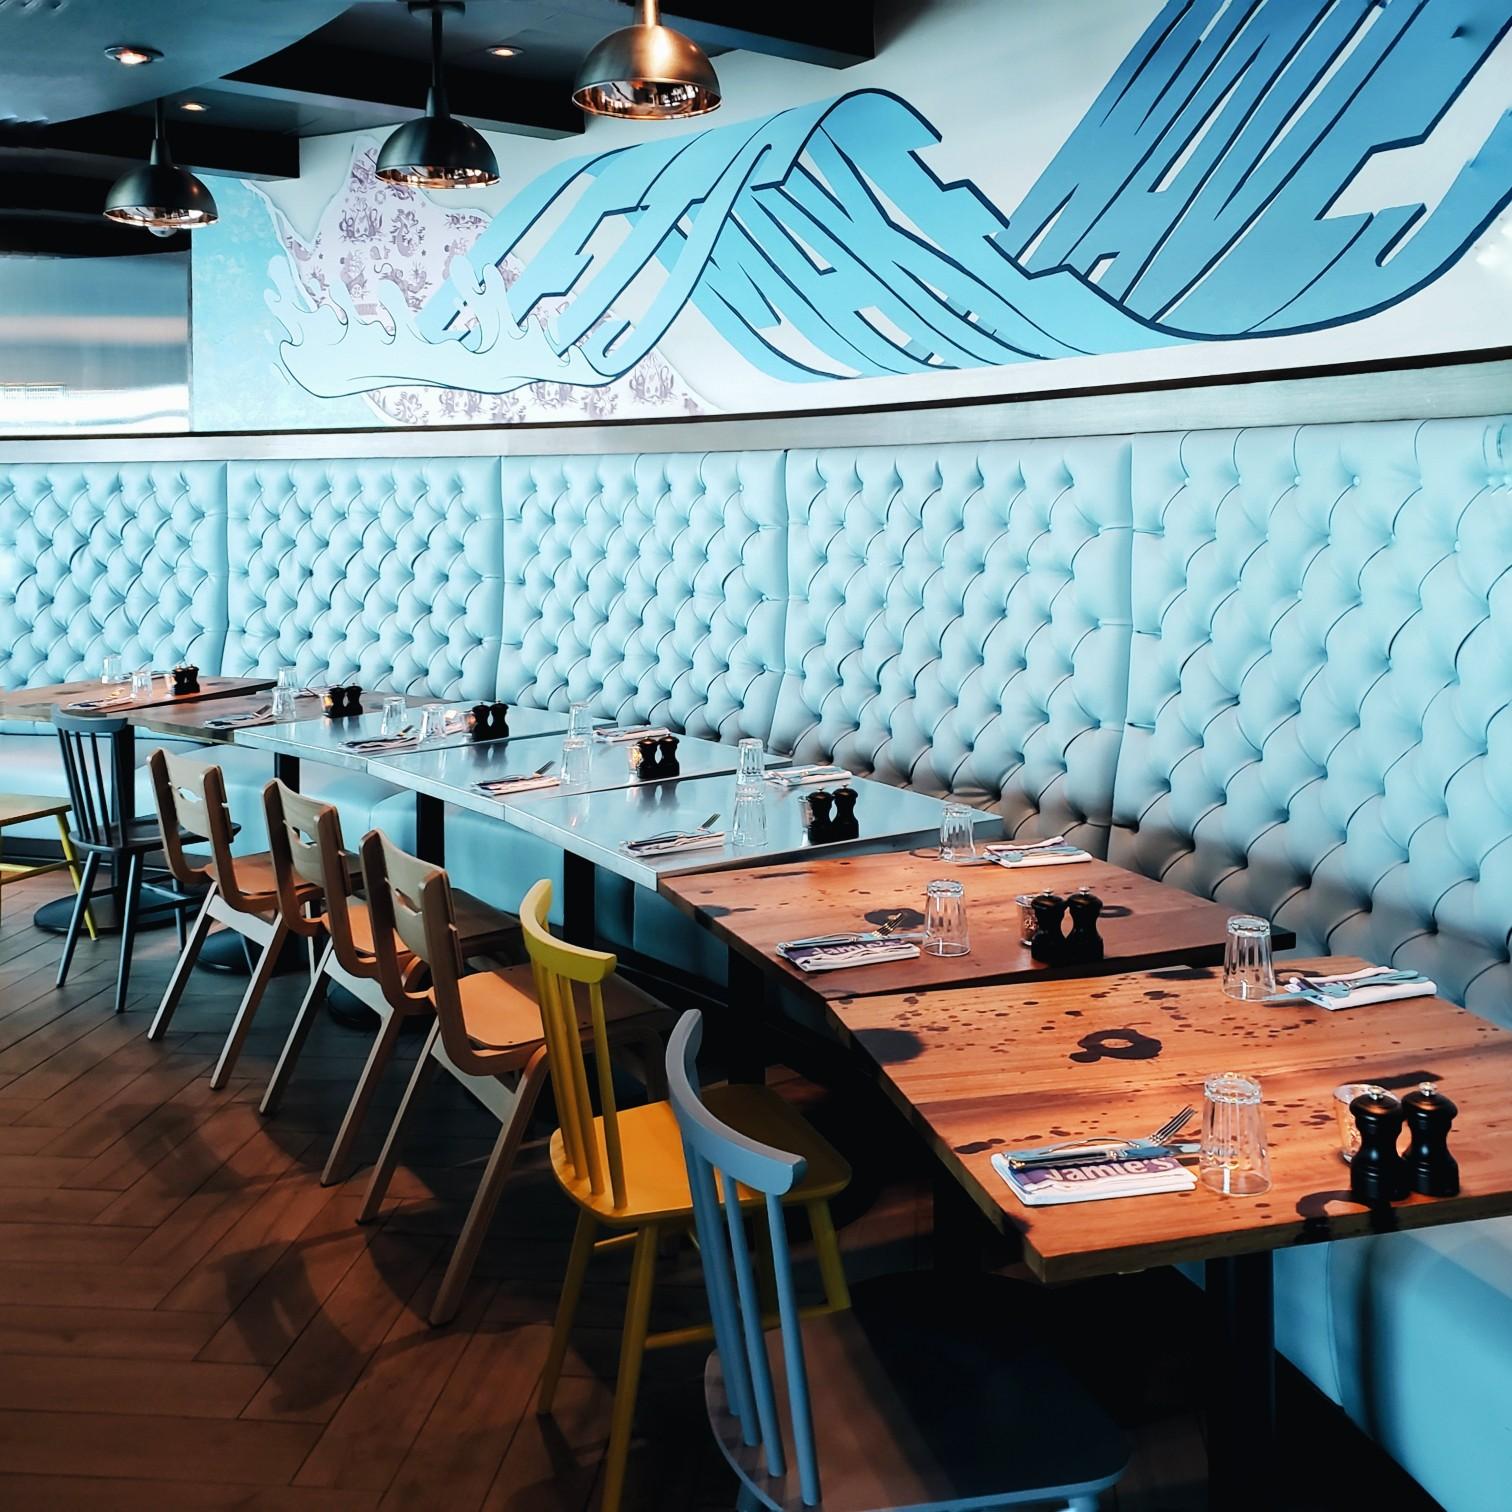 Jamie's Italian Restaurant Mariner of the Seas Royal Caribbean